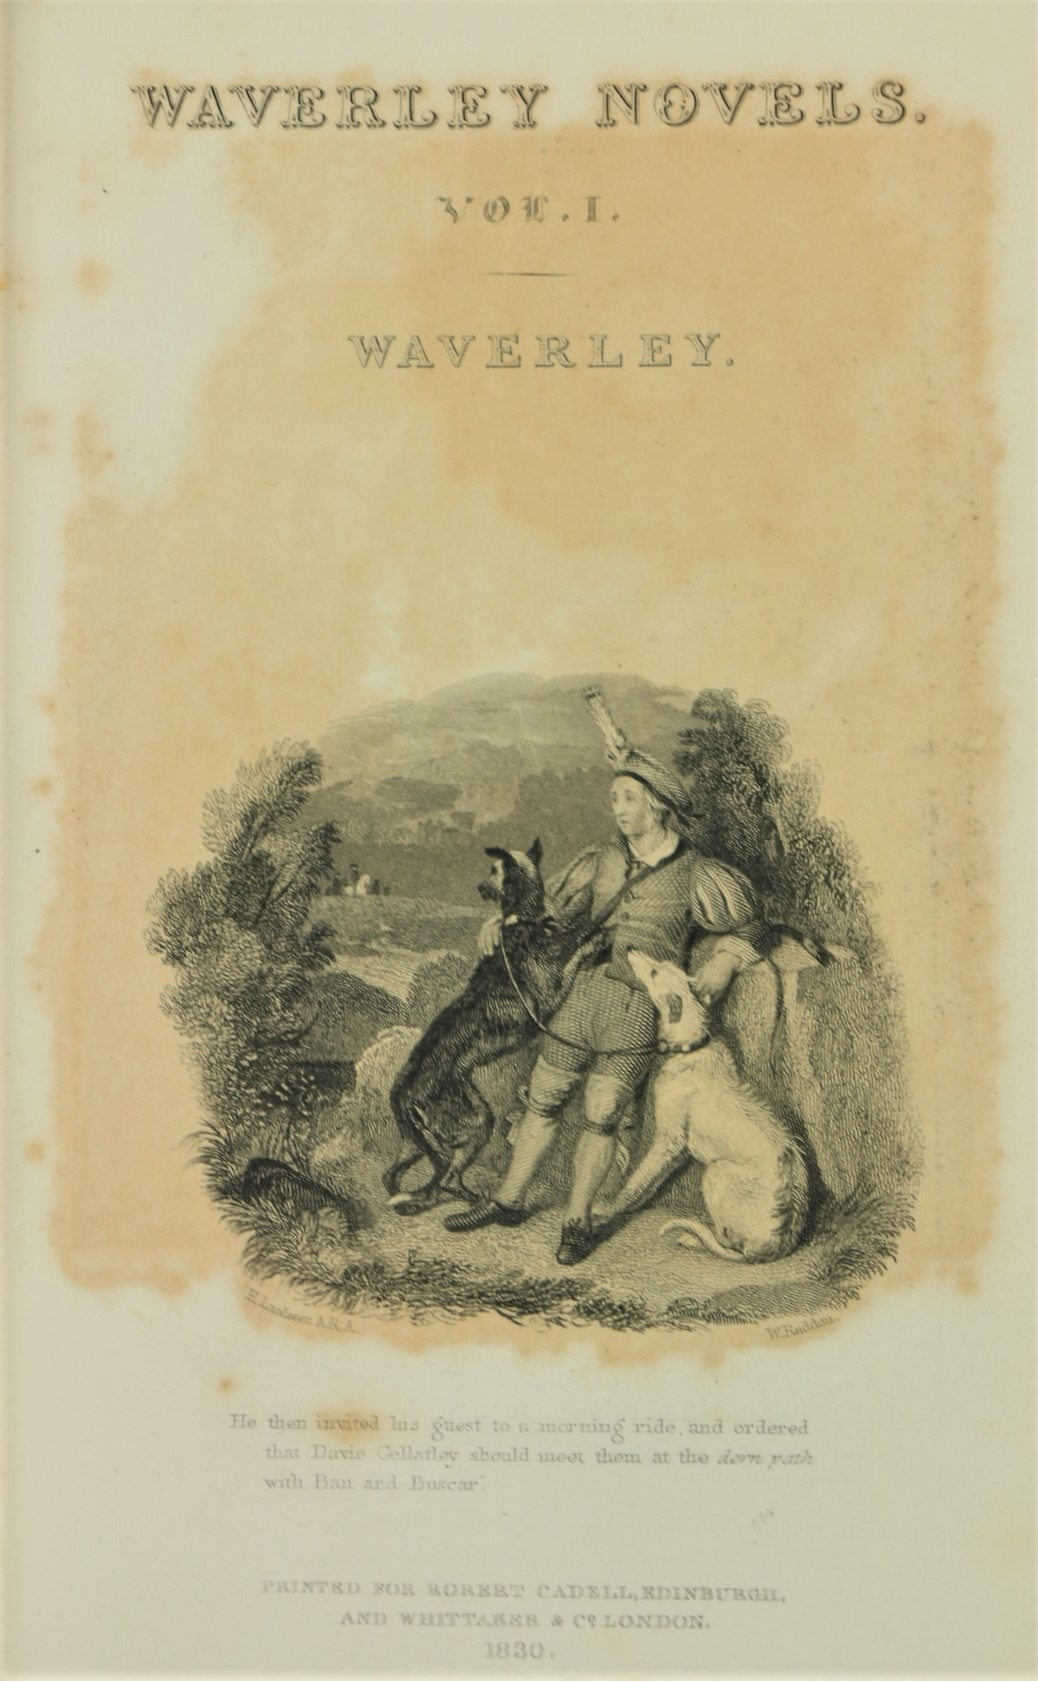 Bindings:ÿ Scott (Sir W.)ÿWaverley Novels, 48 vols. 12mo Edinburgh 1830, Engd. add. titles, - Image 5 of 5